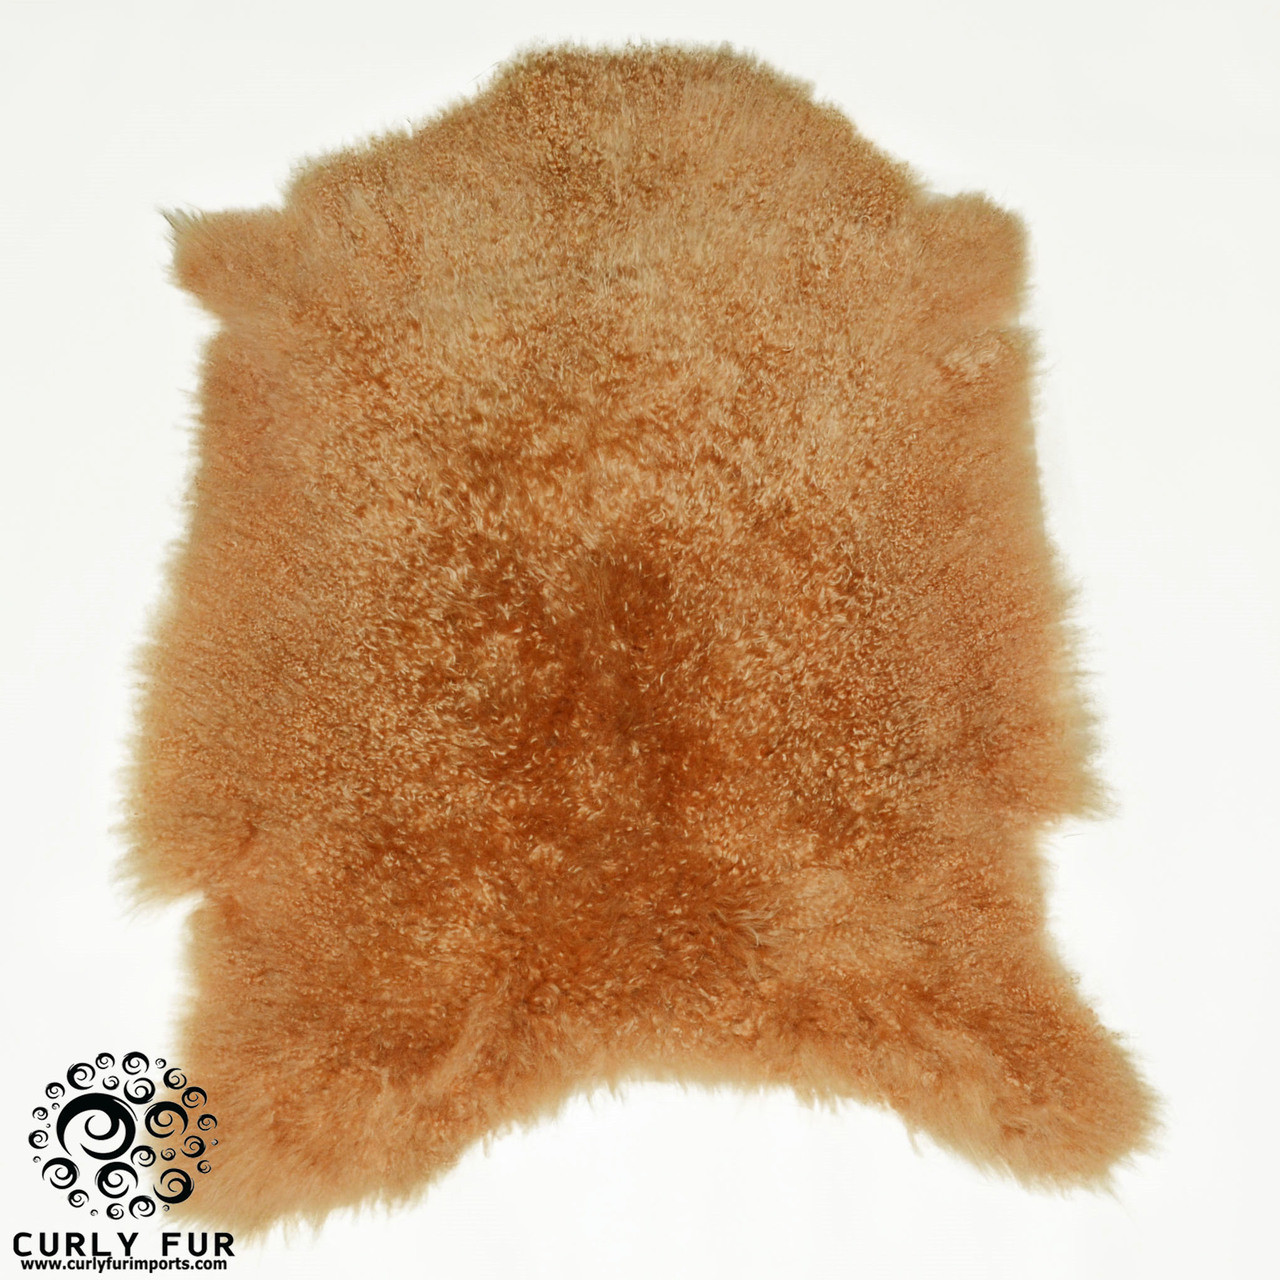 Cashmere Goat Fur Pelt Camel Curly Fur Imports